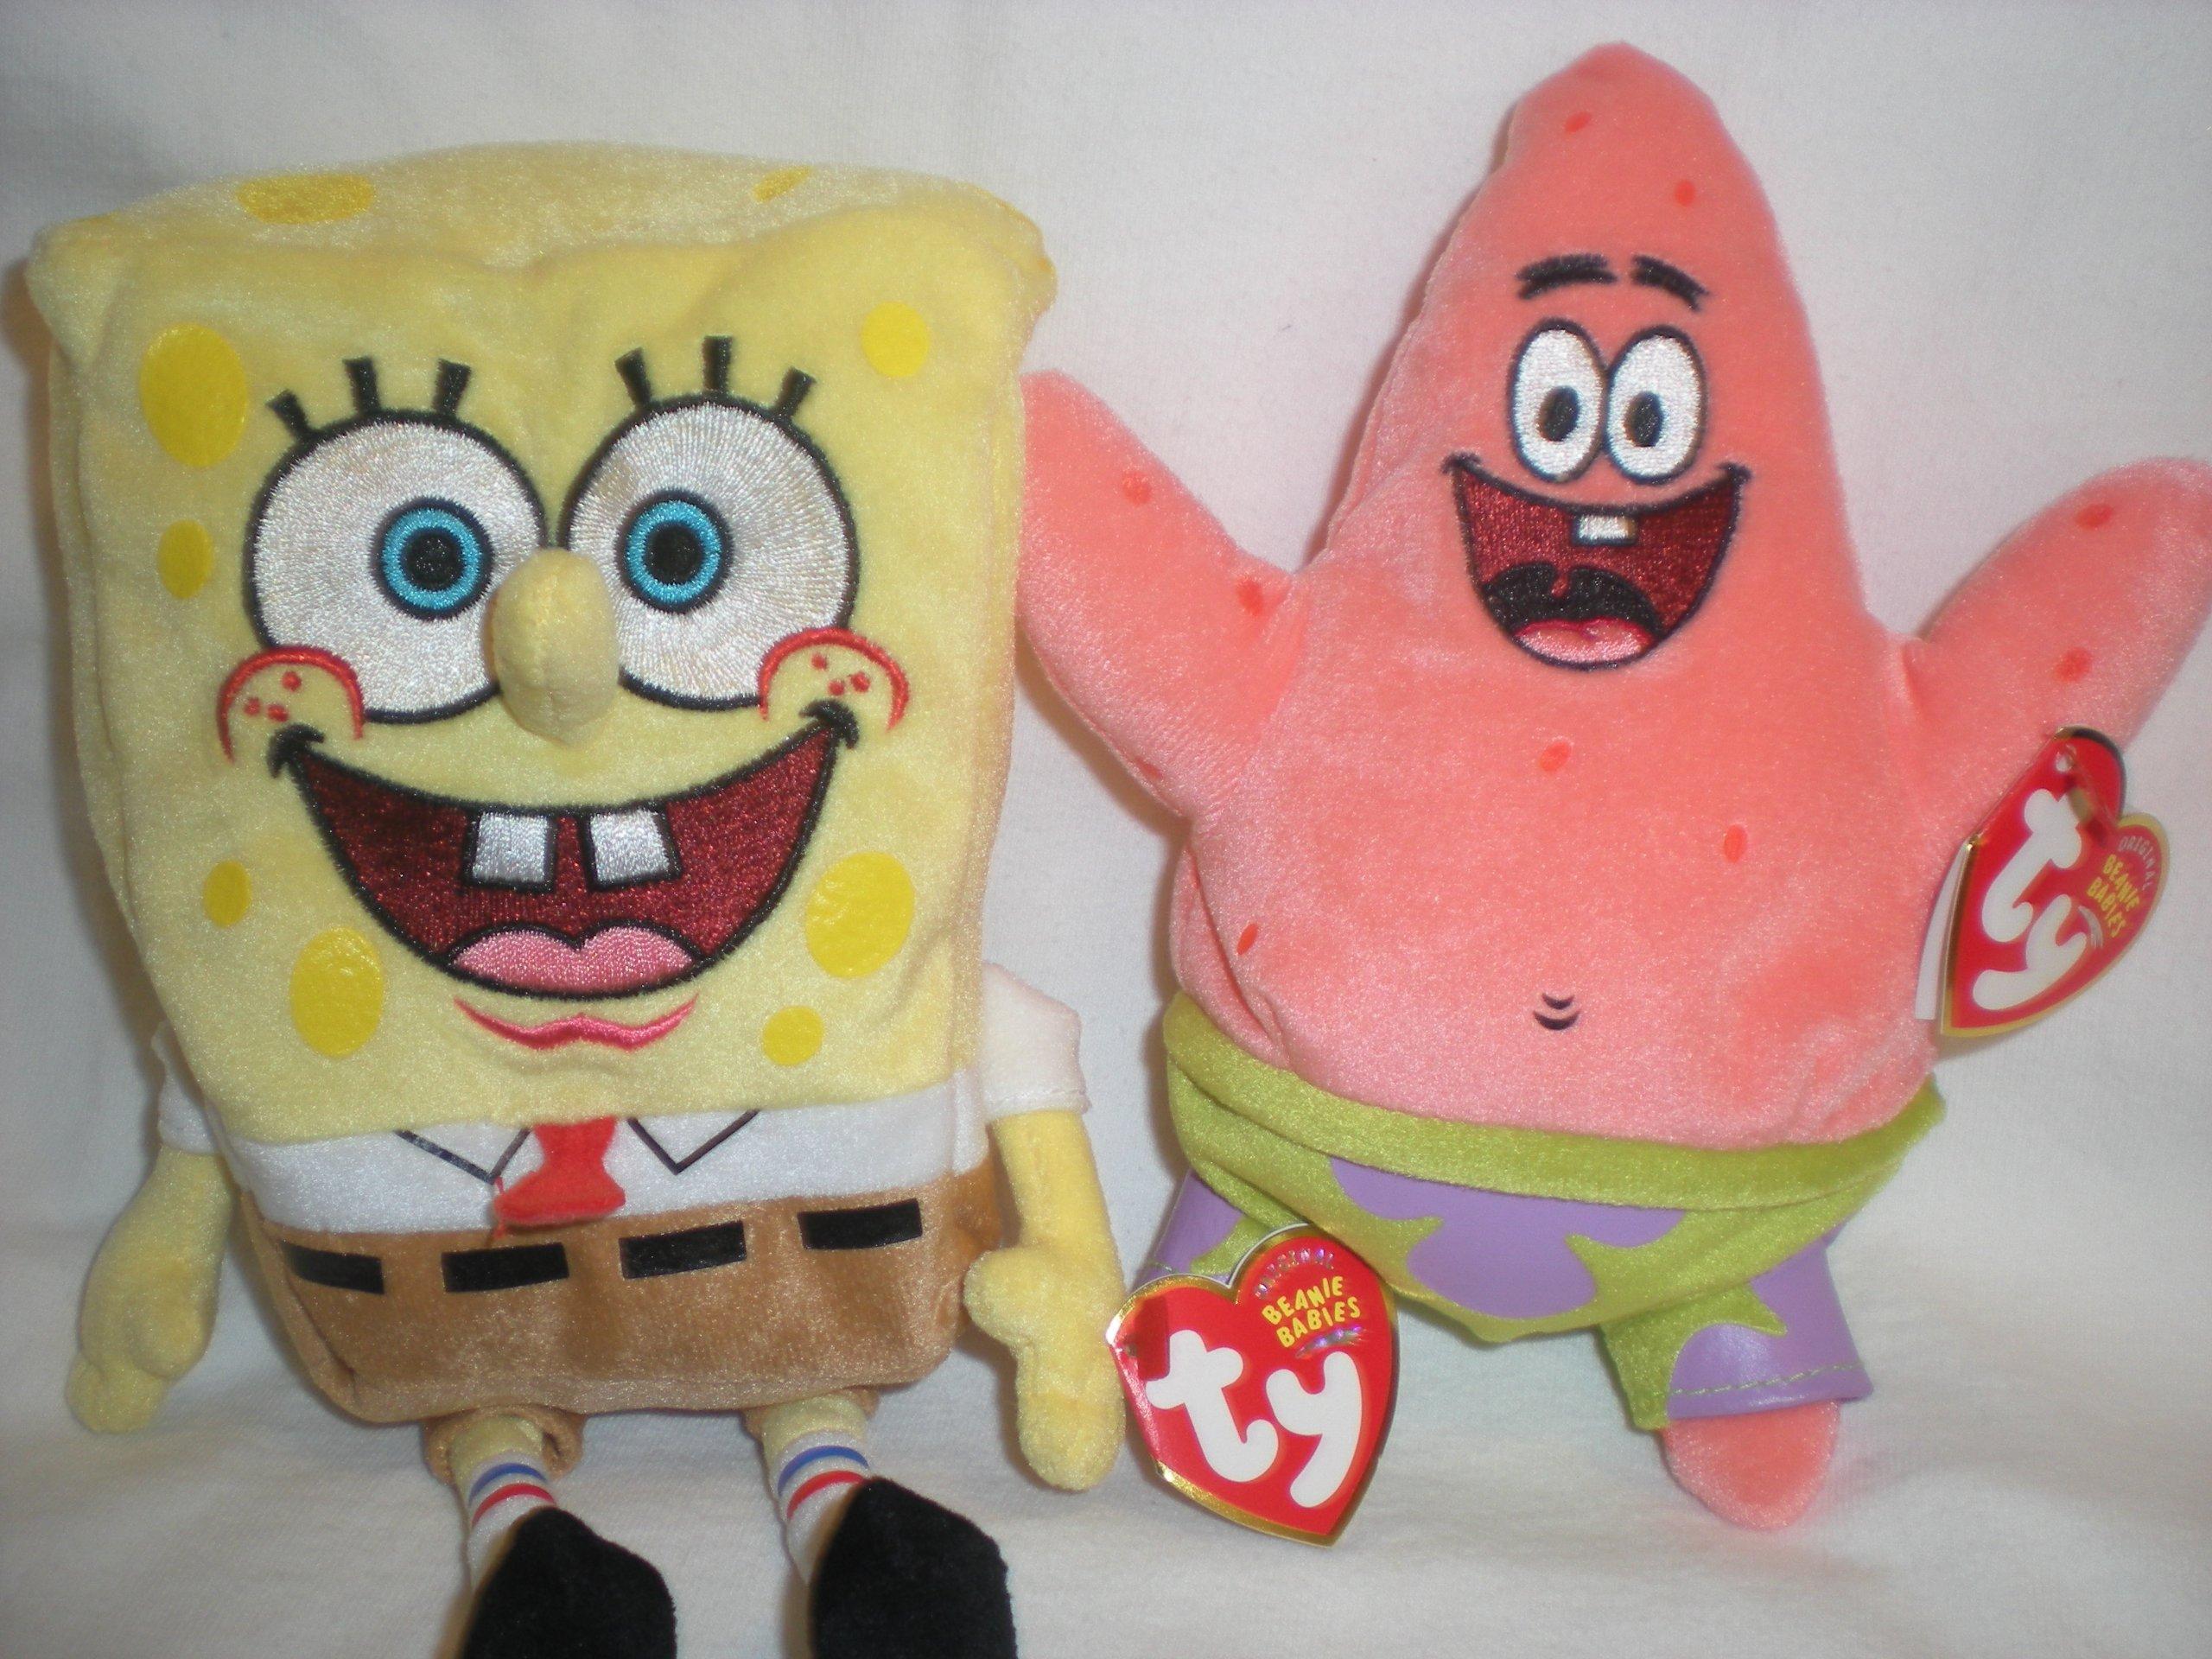 Ty Original SpongeBob SquarePants and Patrick Star Beanie Babies Plush by Ty Spongebob